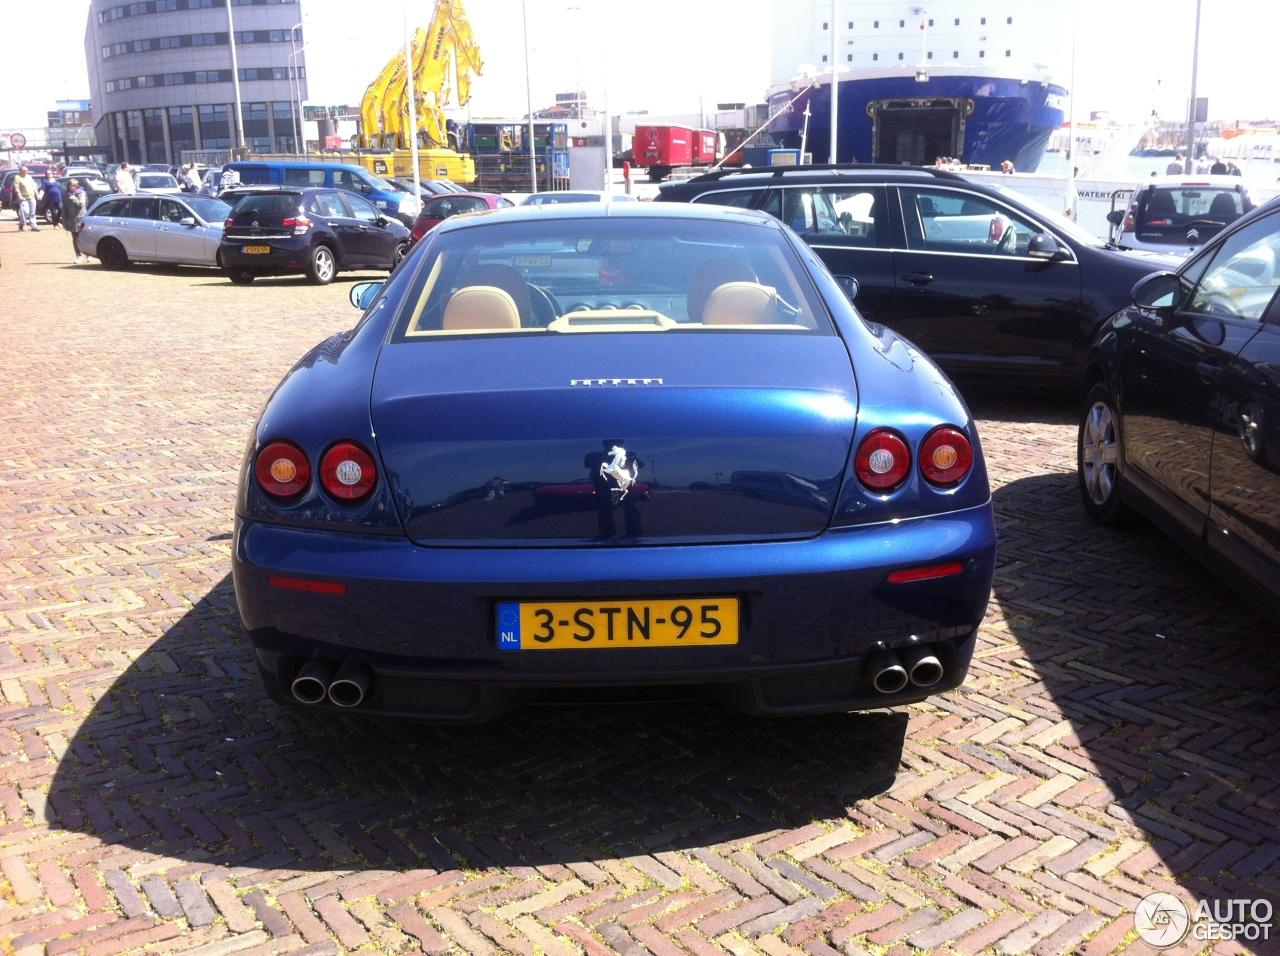 Ferrari 612 Scaglietti 19 Mei 2014 Autogespot